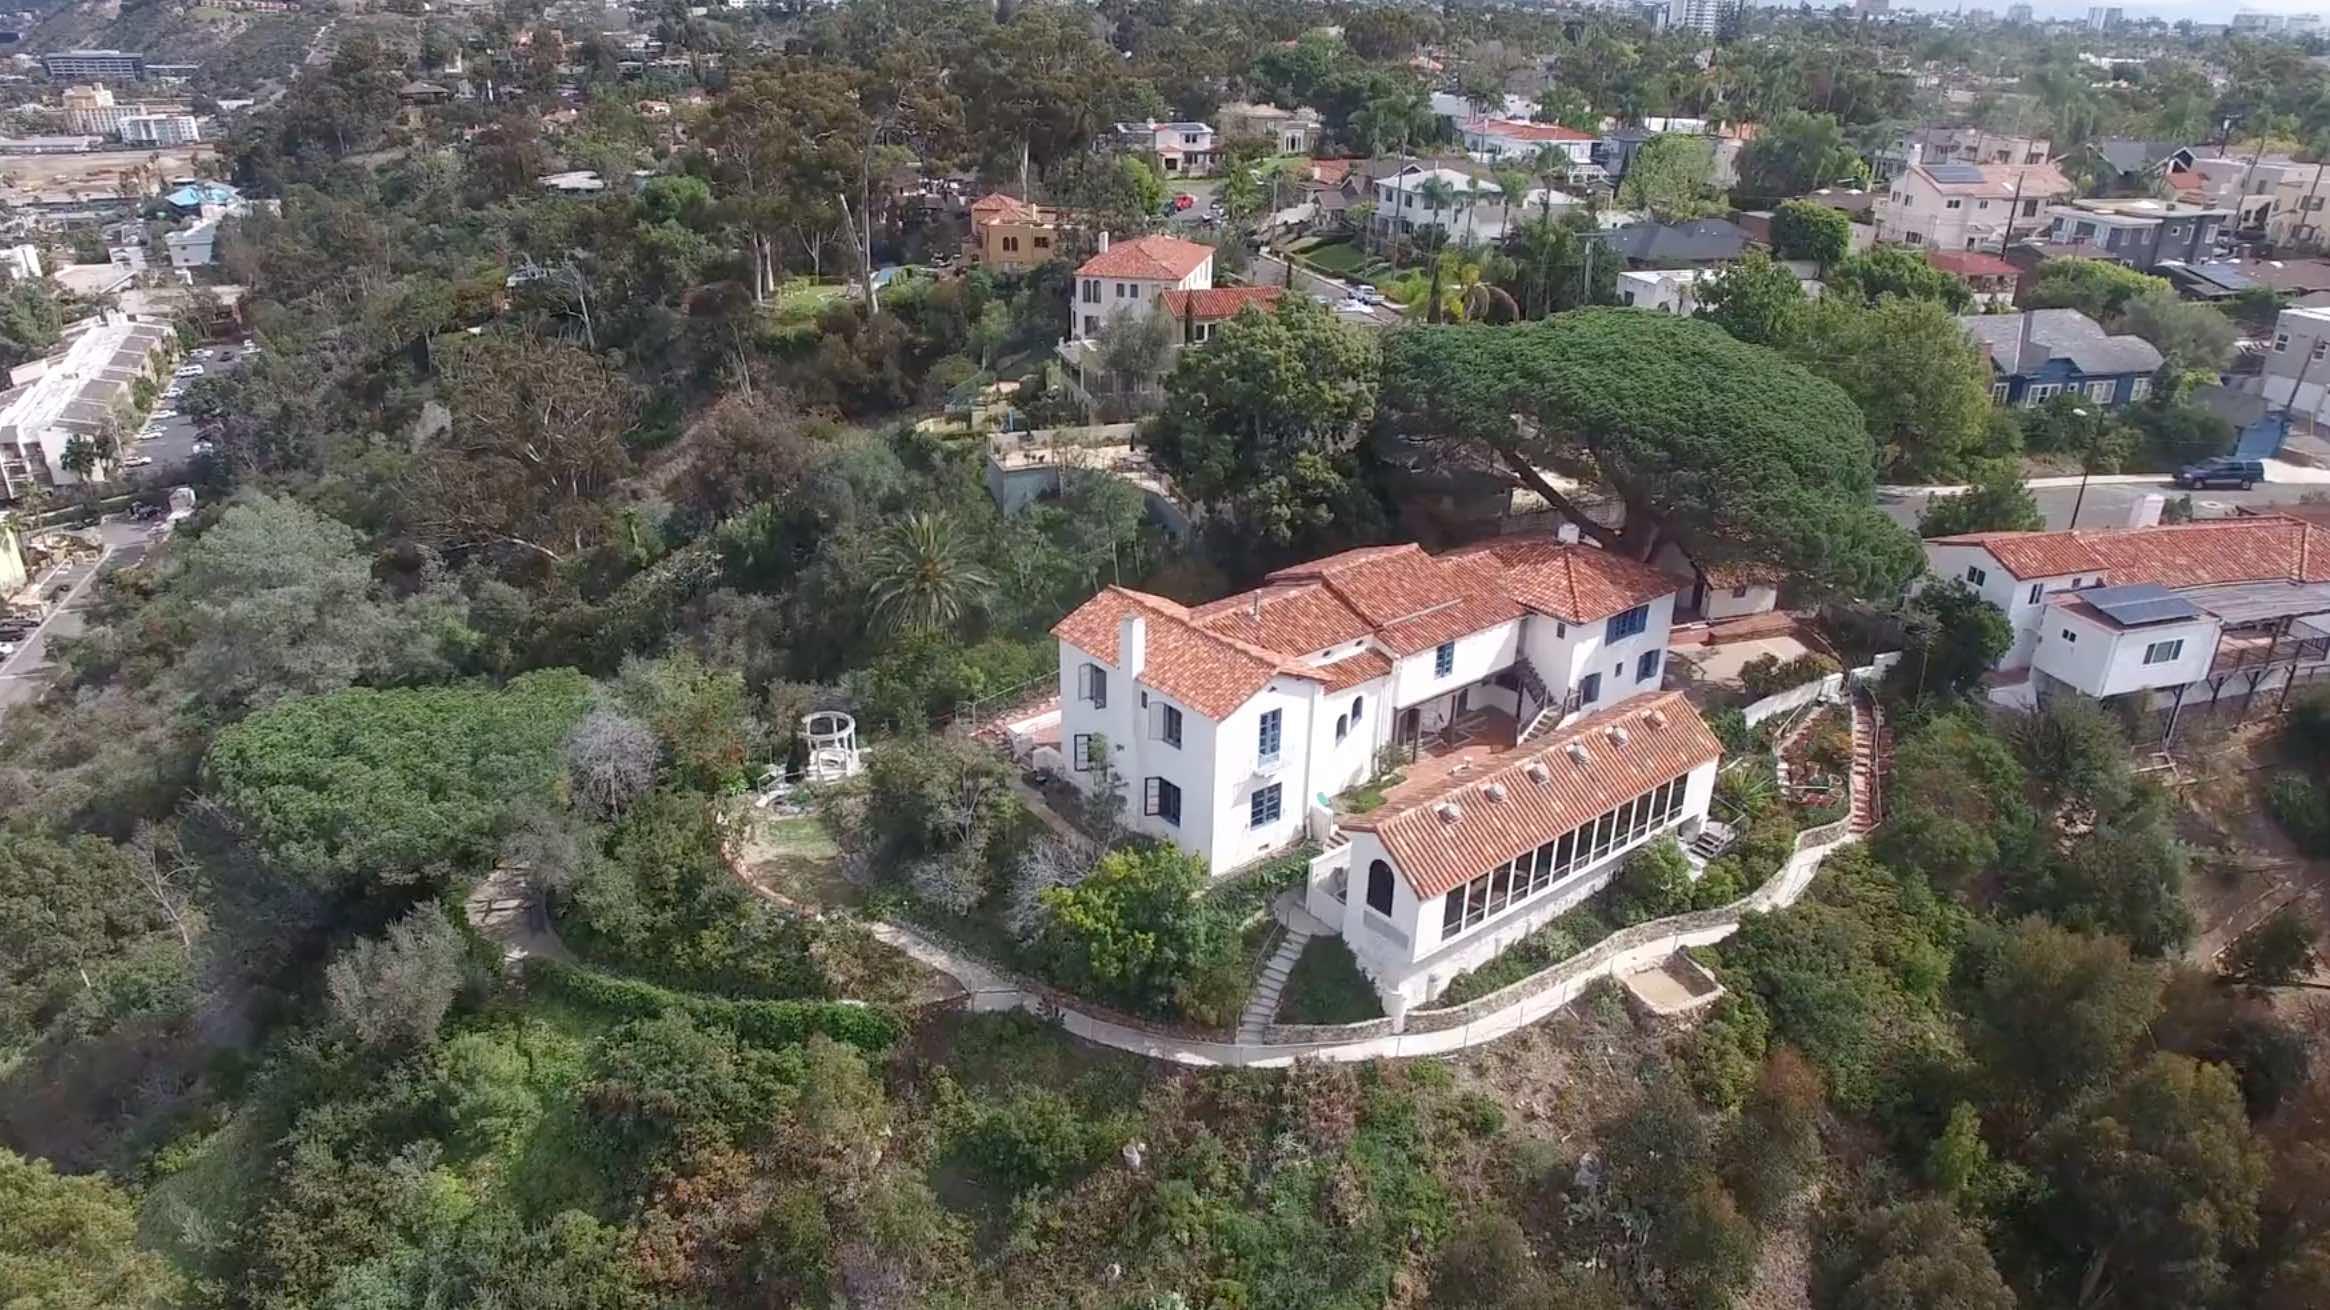 Villa-Hermosa-Aerial-12